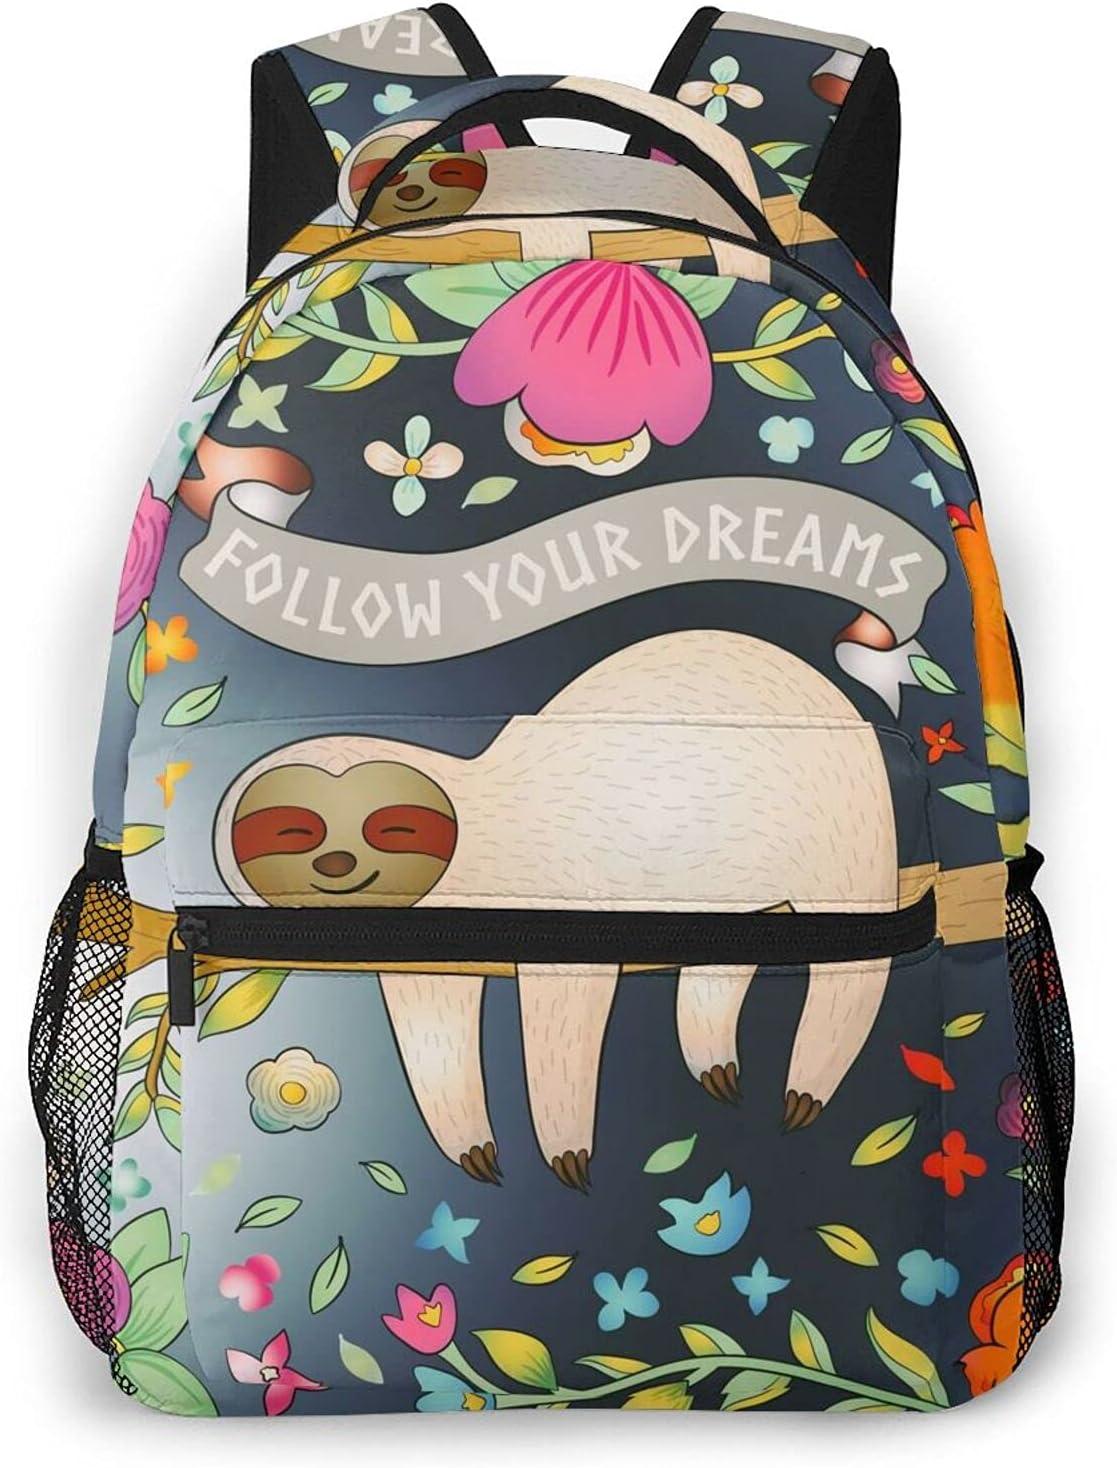 Baby Sloth Yoga Credence Backpack Laptop Daypack Hiking Shoulder Max 66% OFF